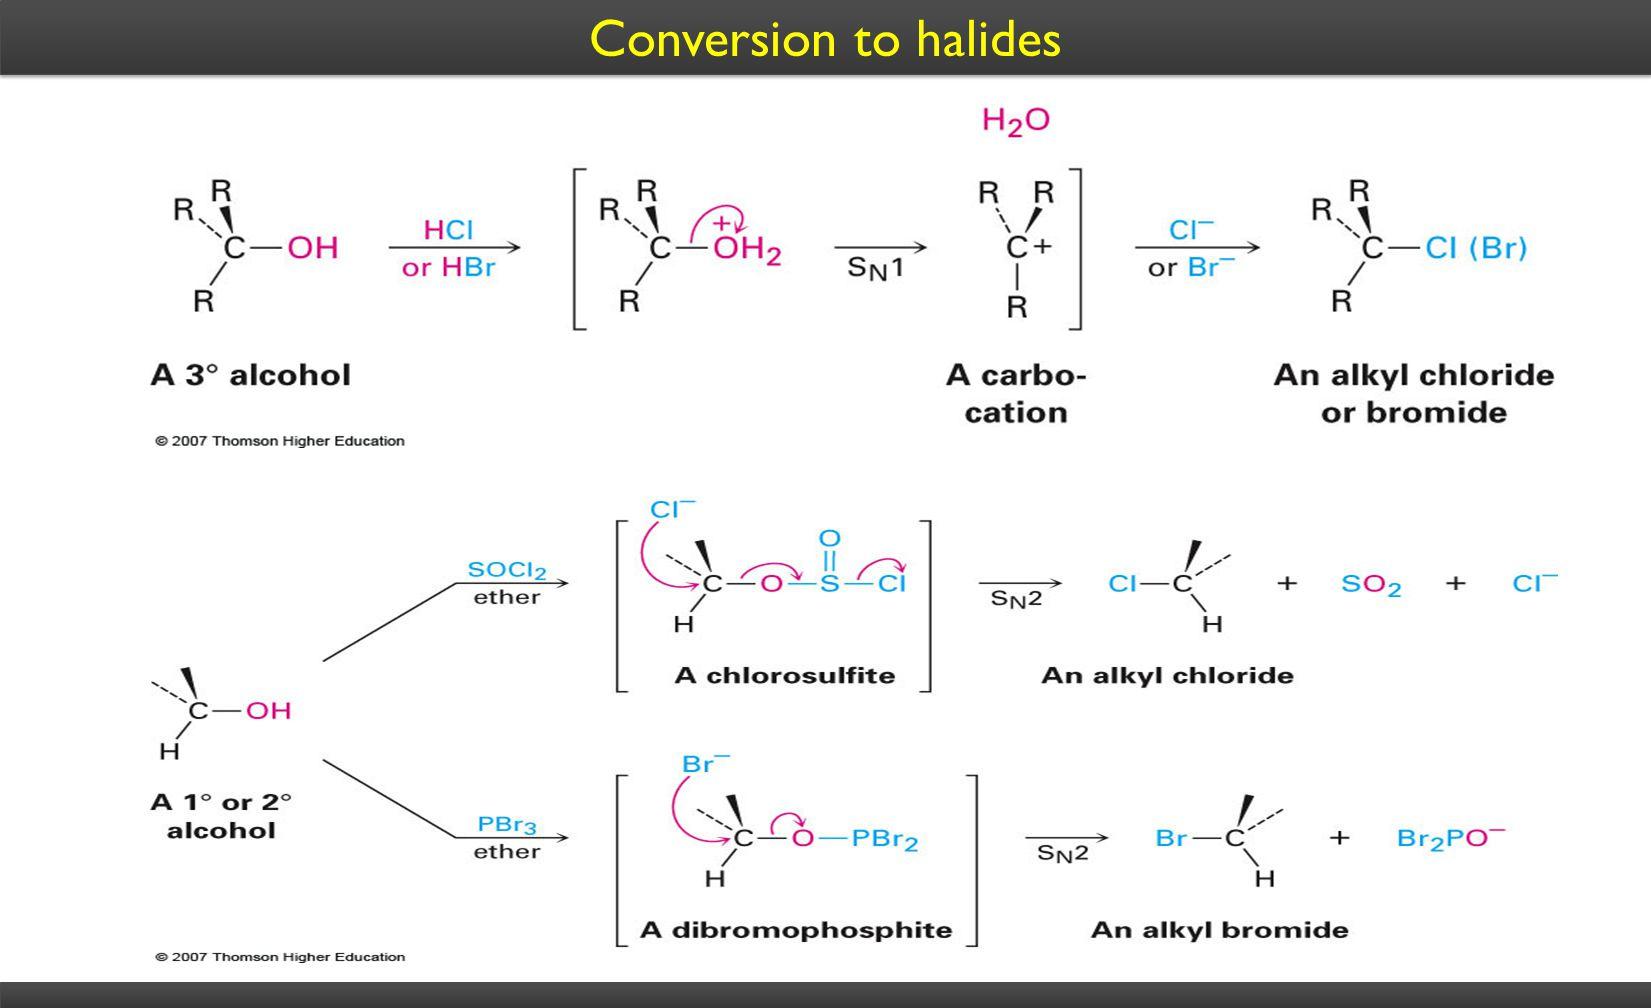 Conversion to halides